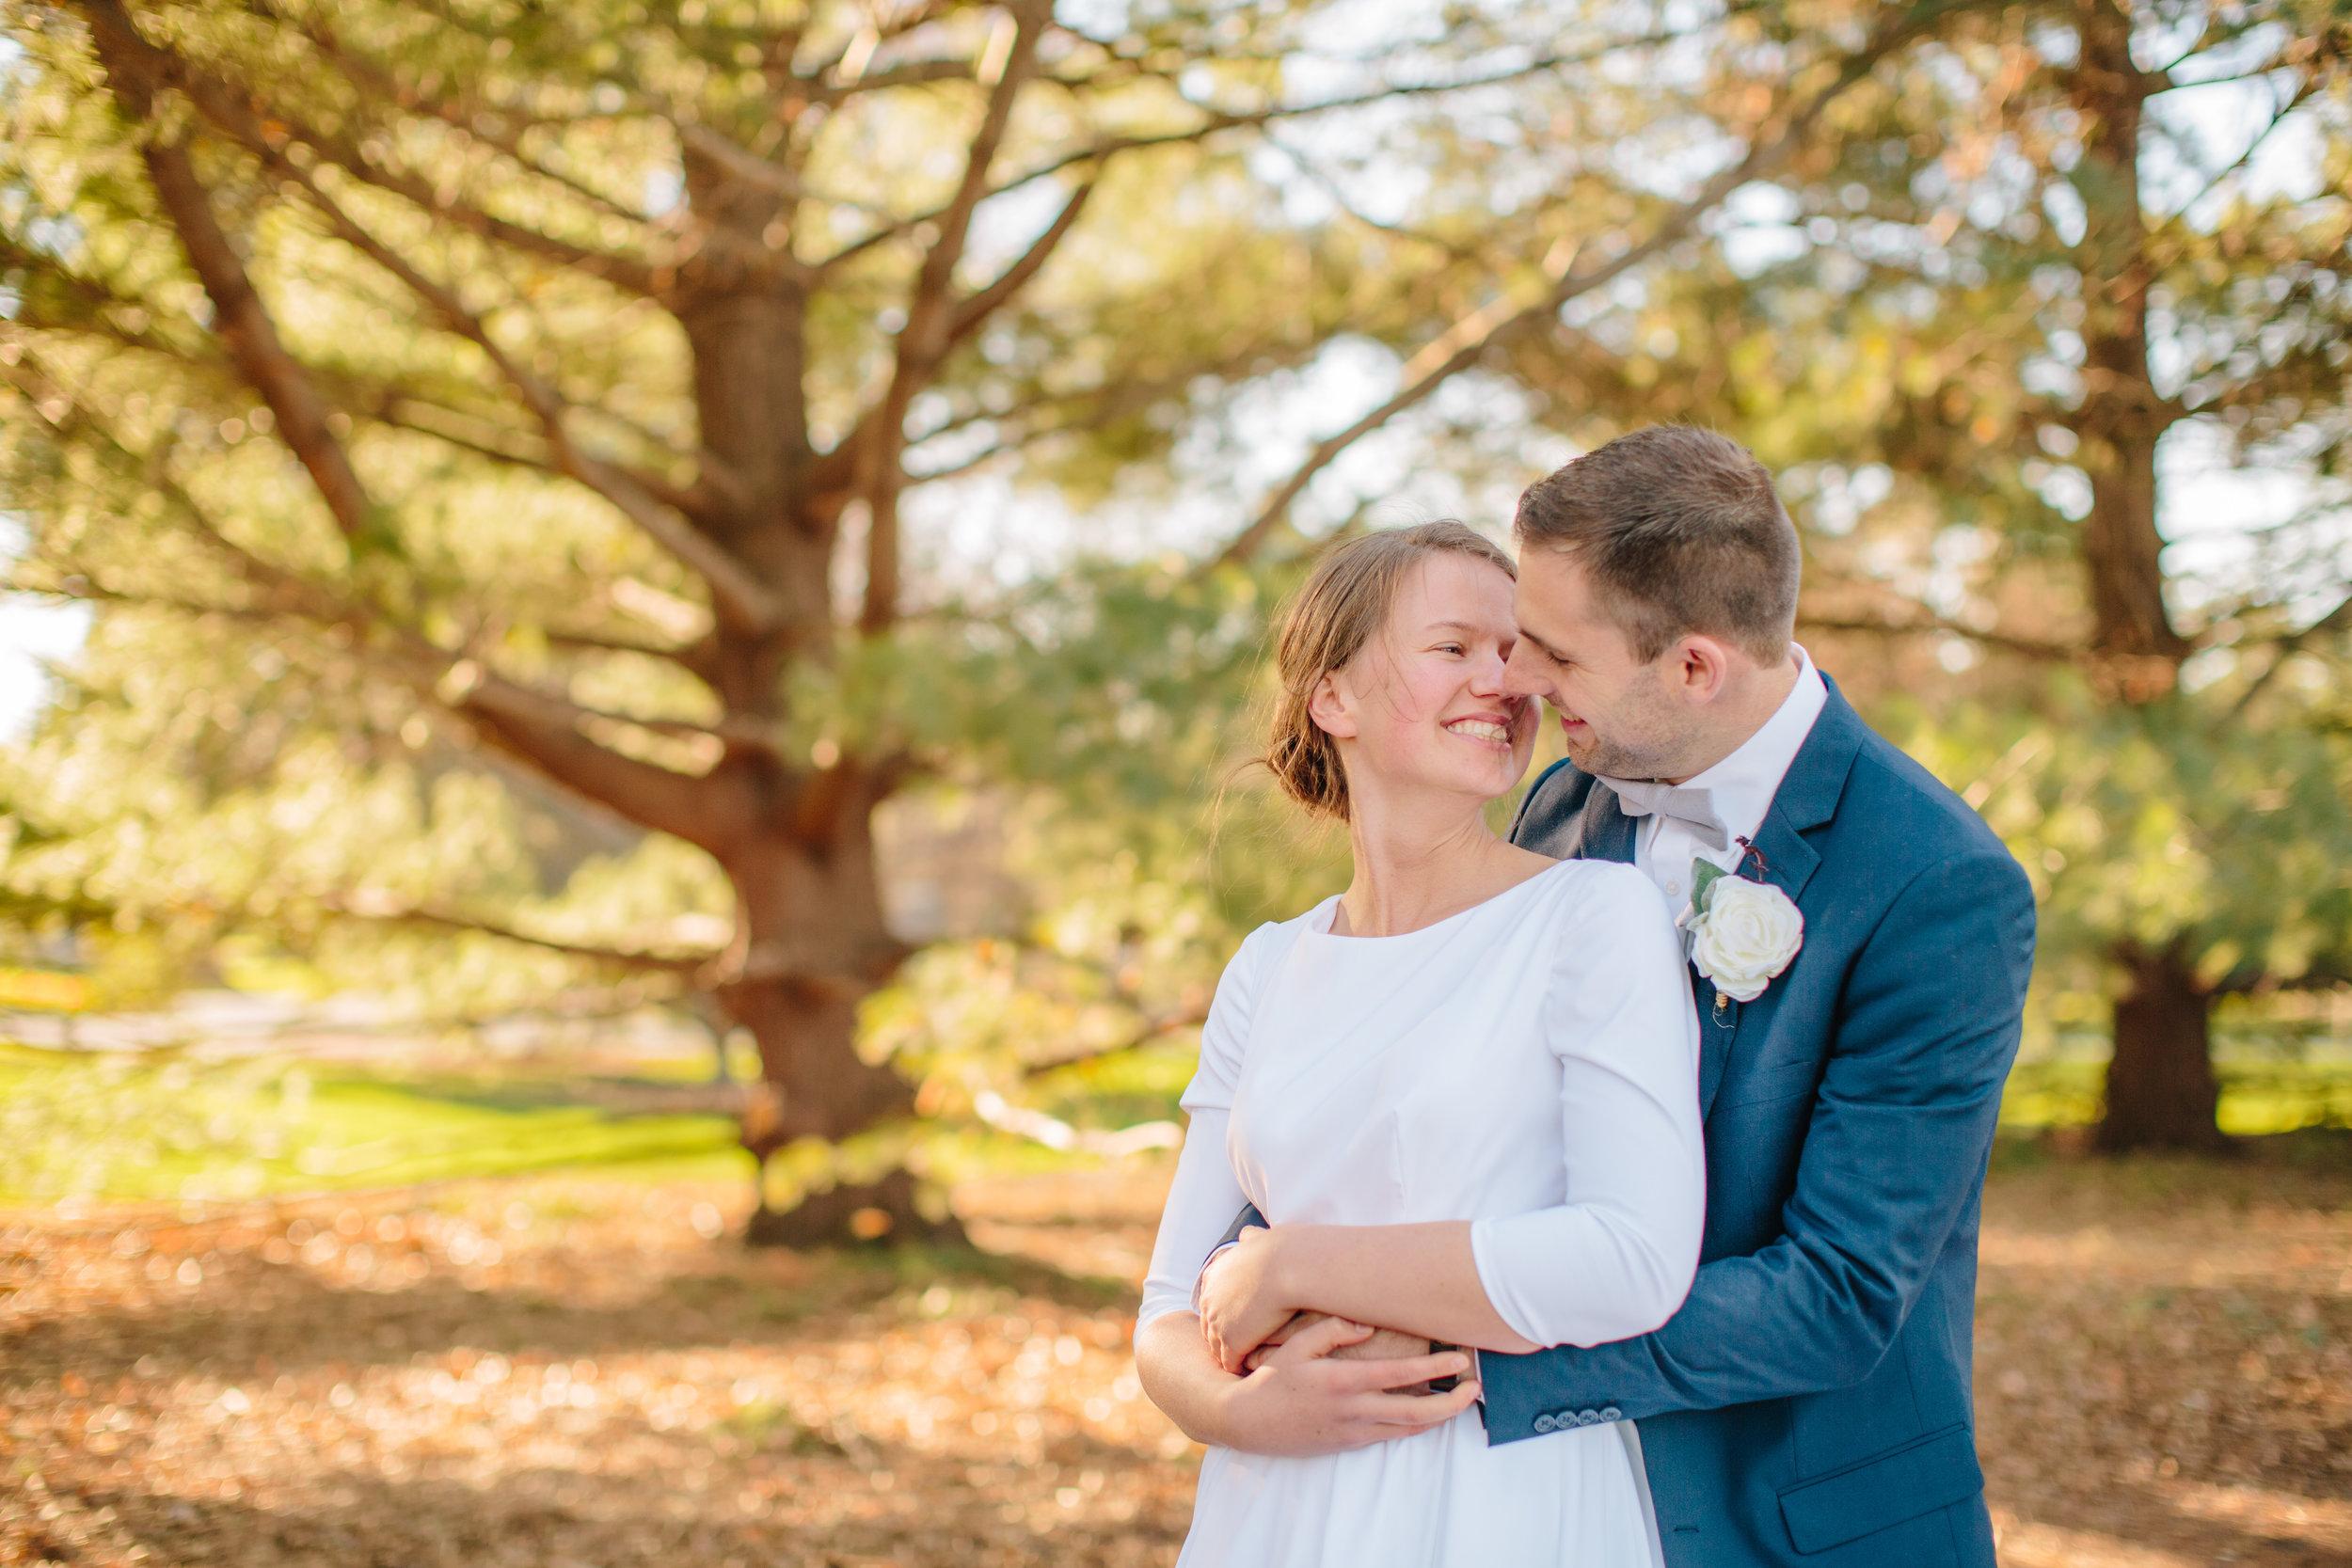 classic vibrant fun wedding photographers in Des MOines IOwa